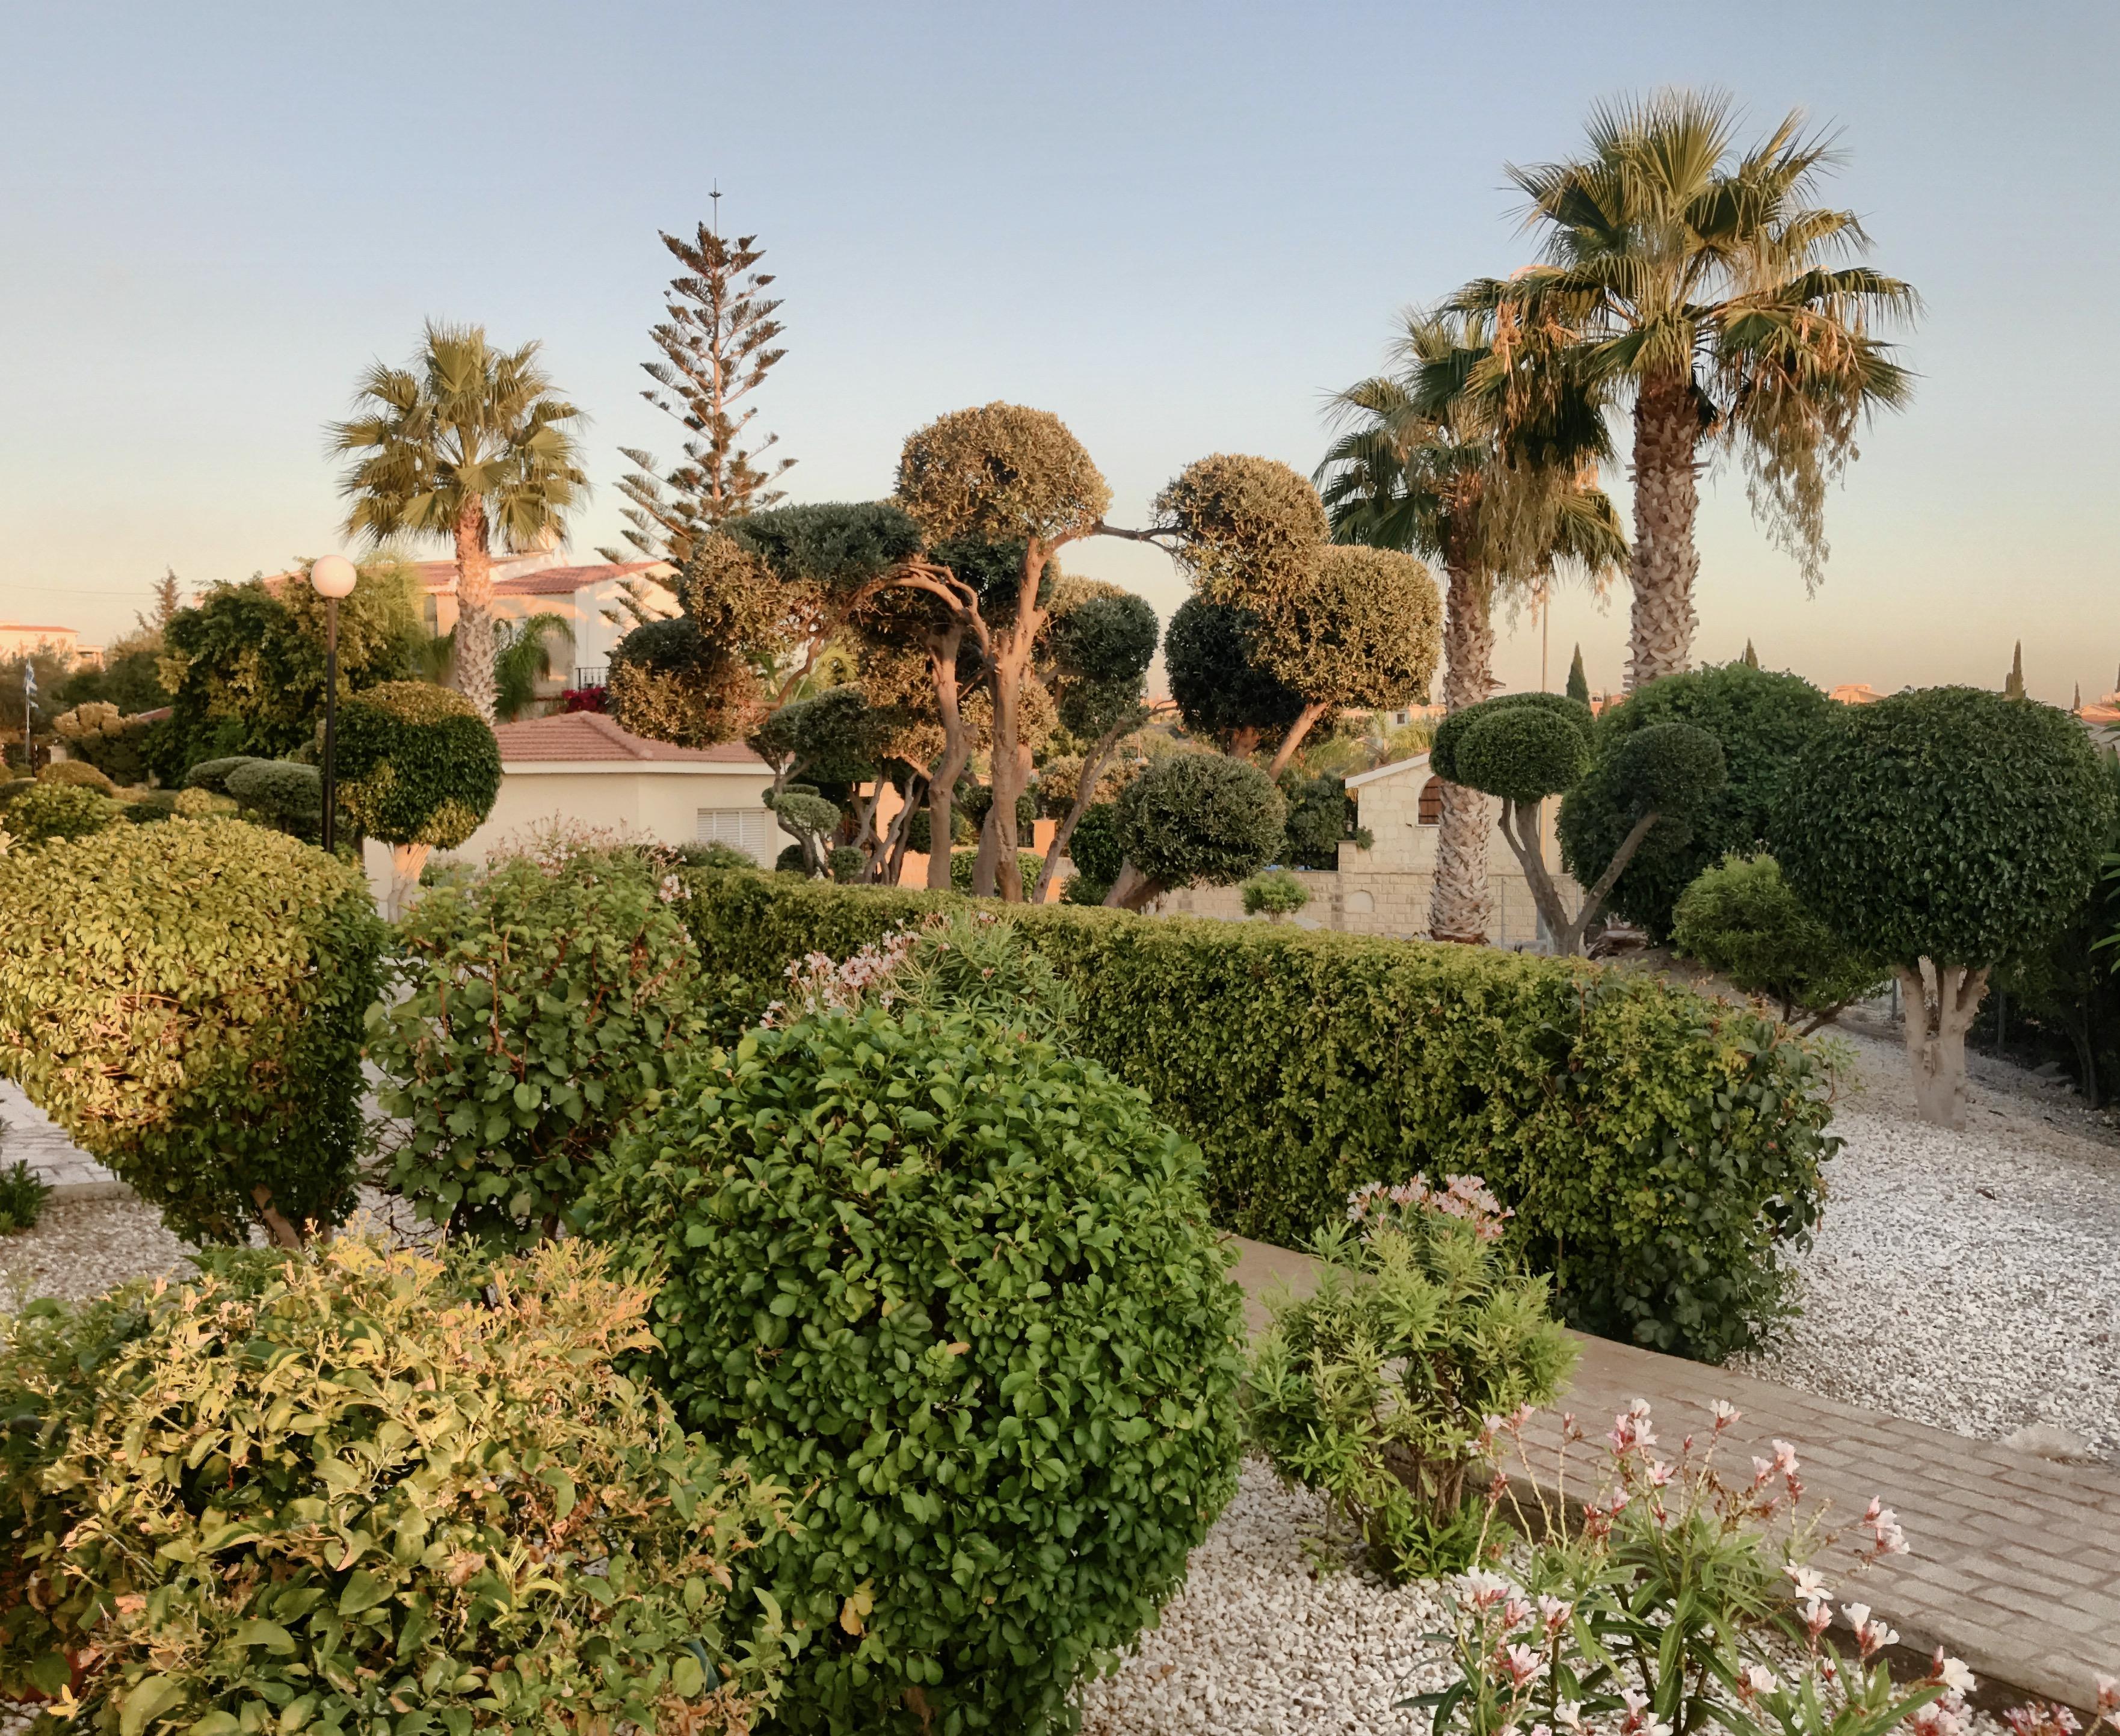 Cyprus apartment gardens